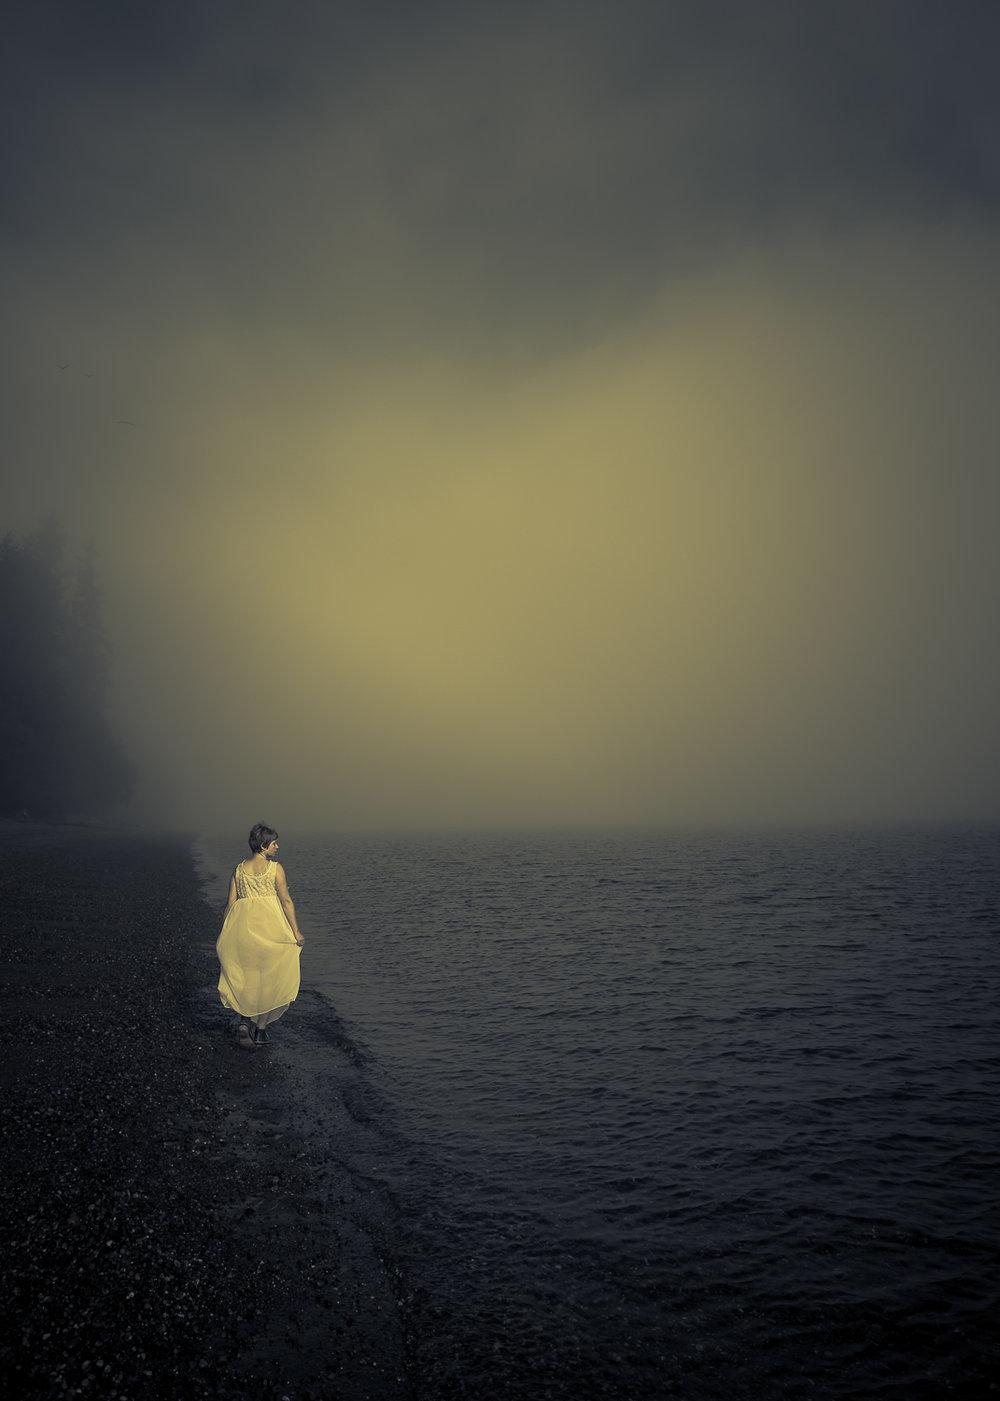 sarahbsmithart-dreams-ghosts-0151.jpg